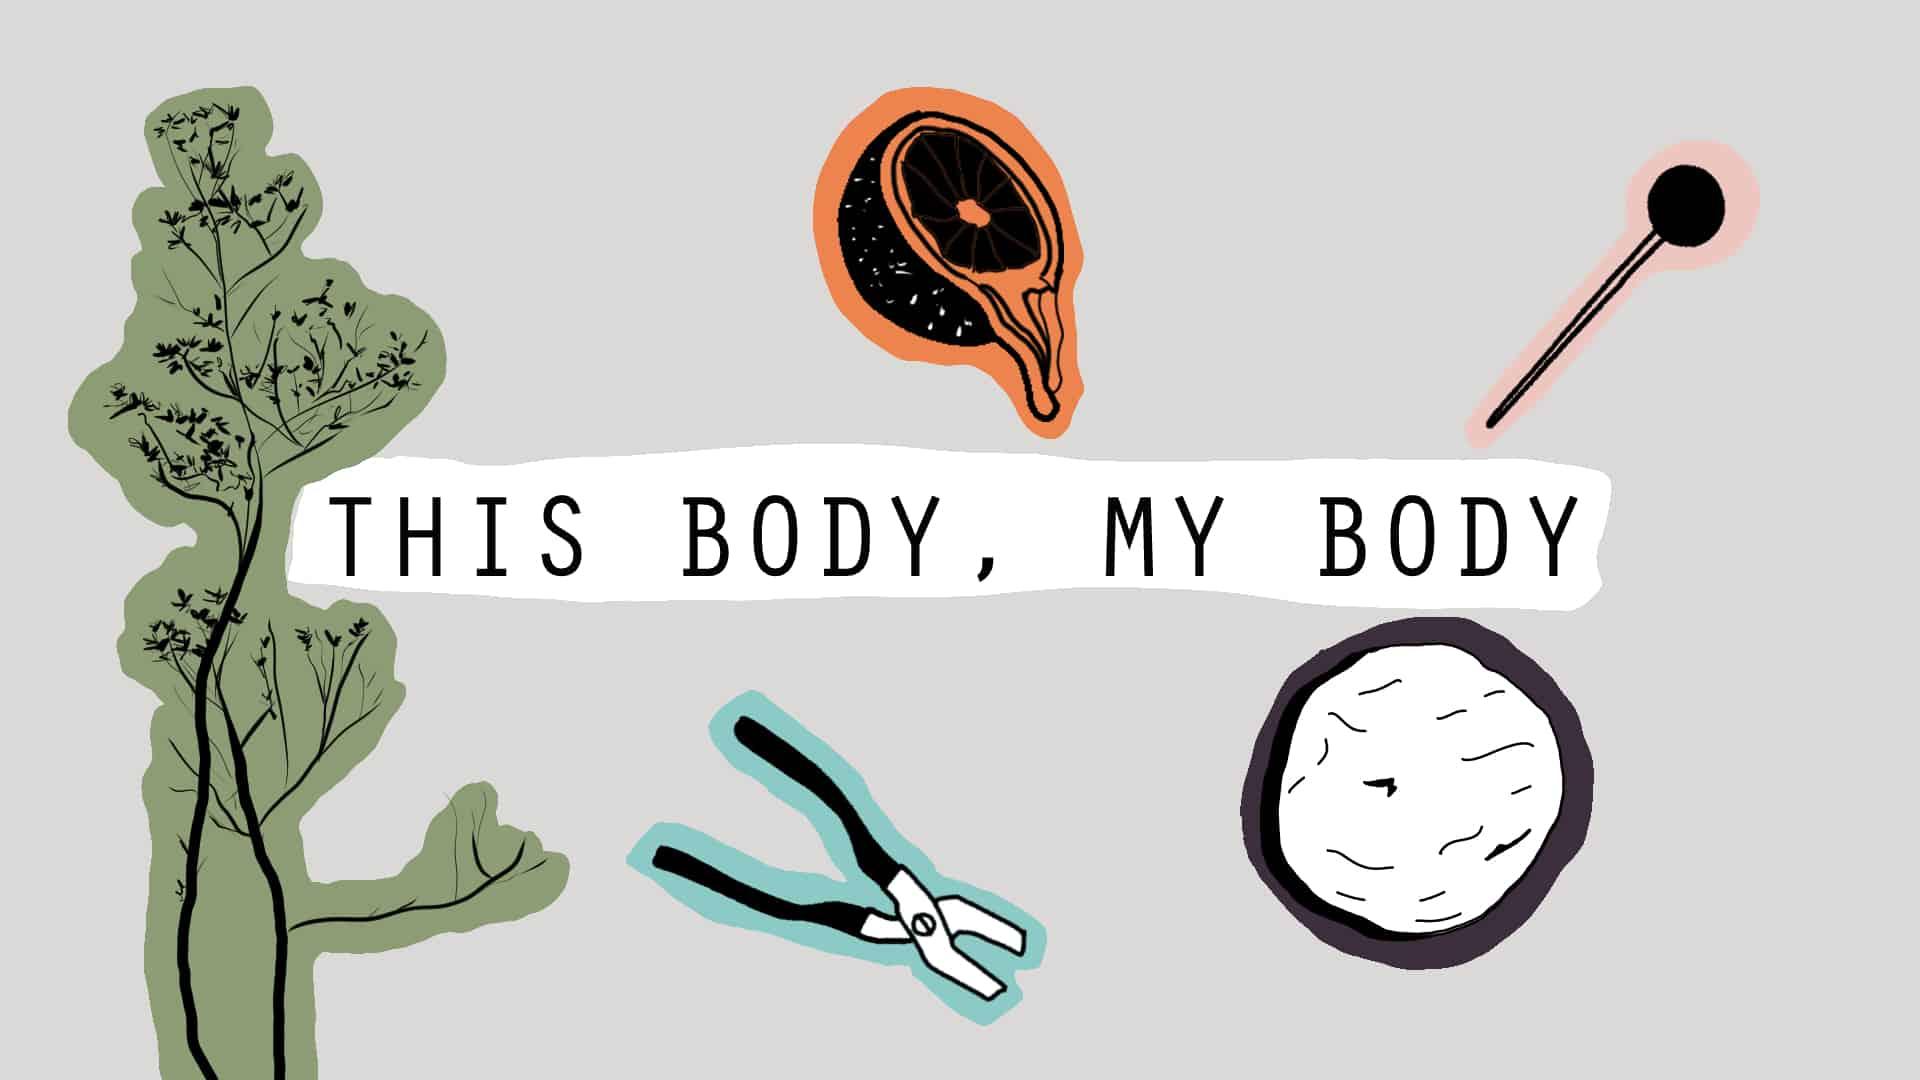 This body, my body